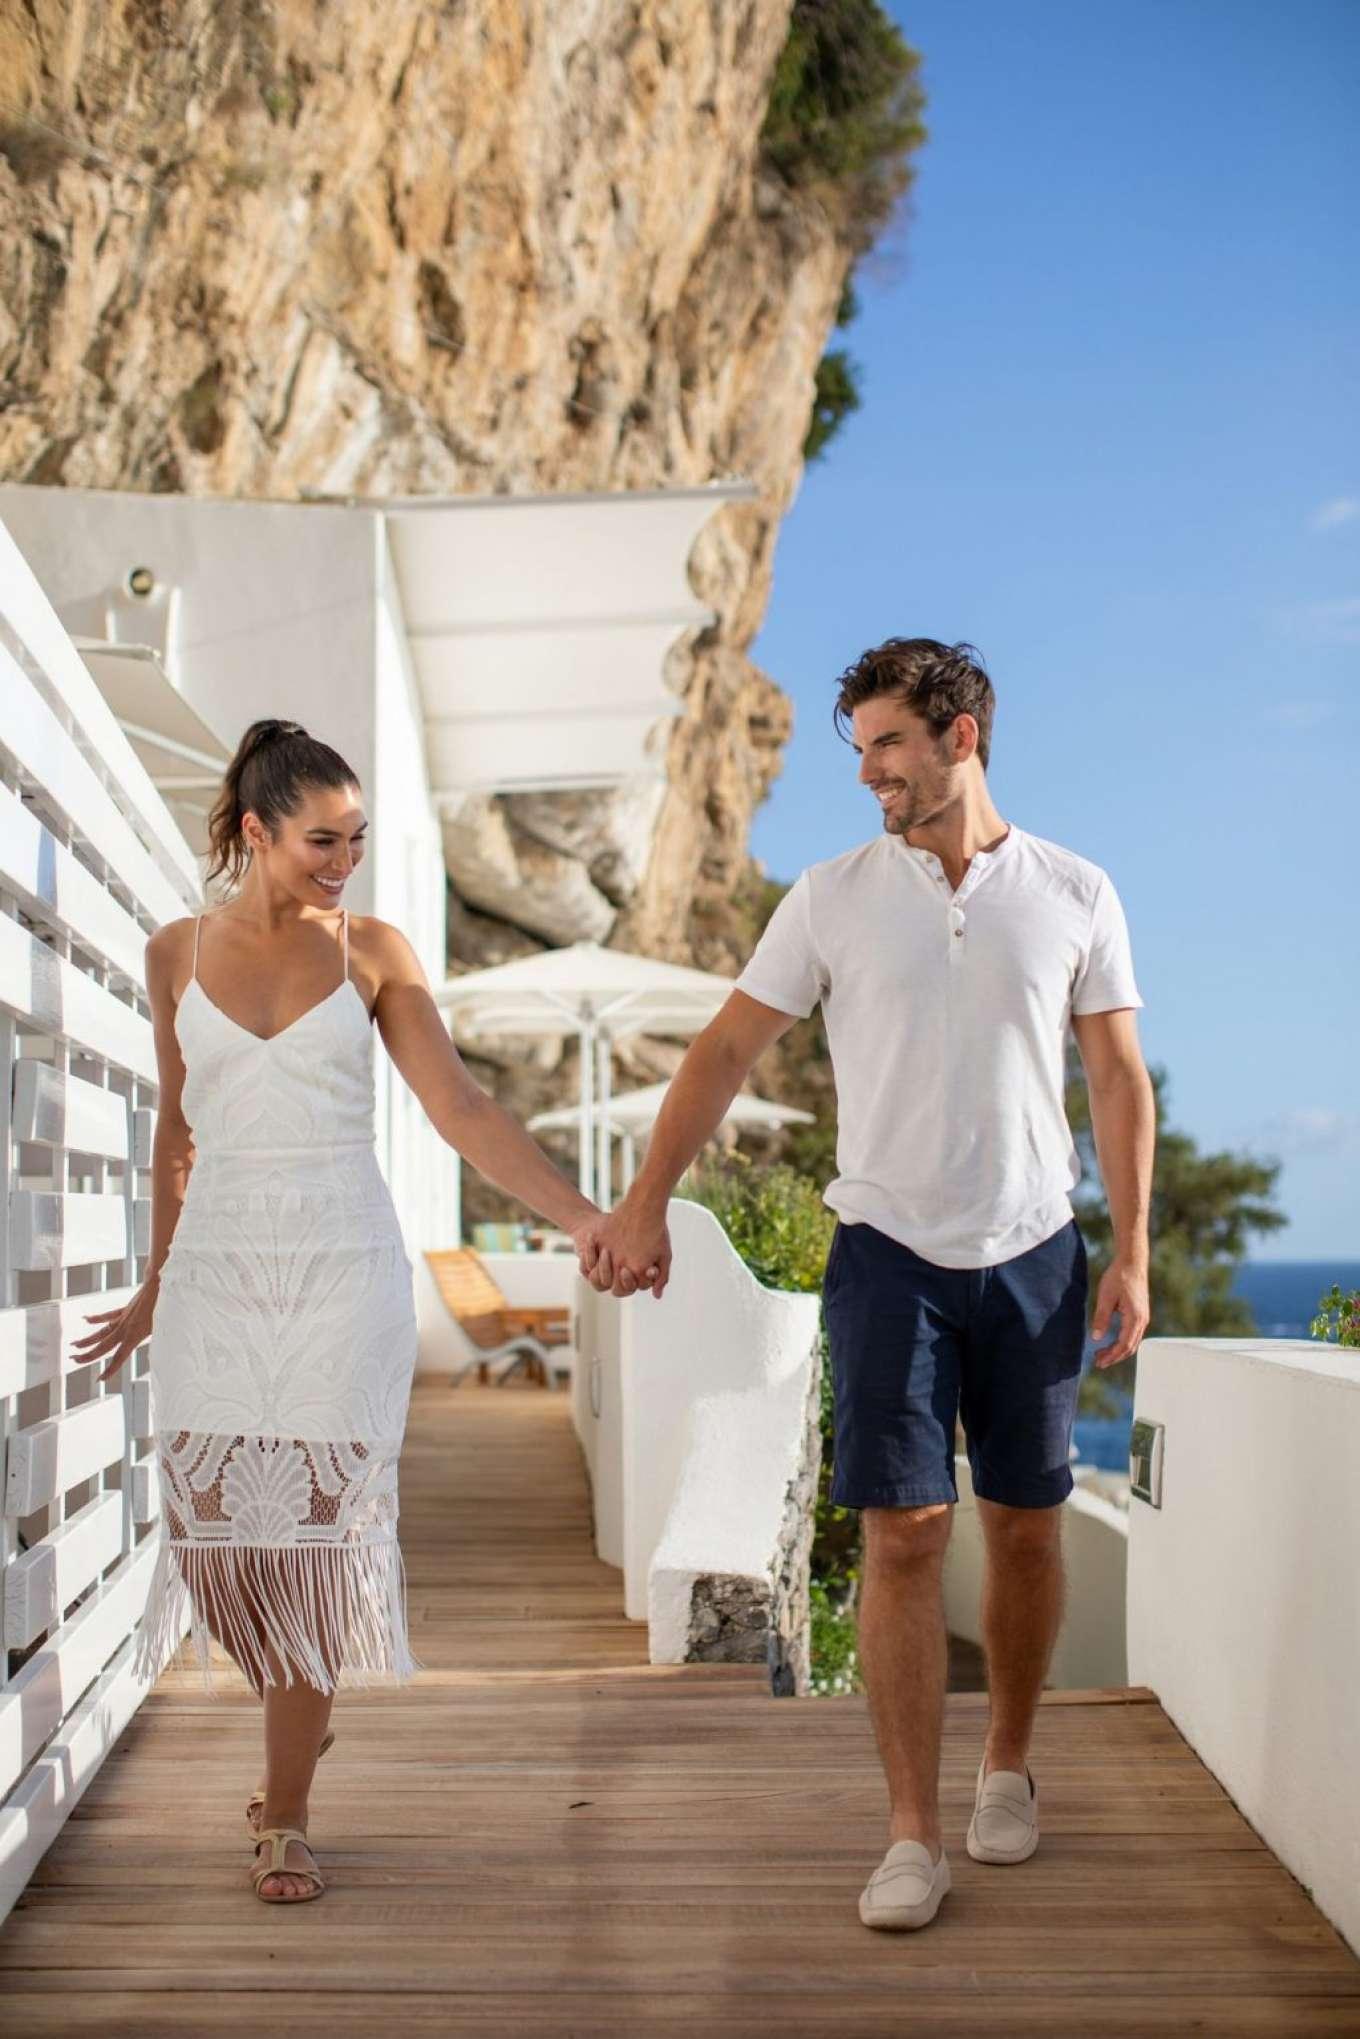 Ashley Iaconetti 2019 : Ashley Iaconetti and Jared Haibon on their honeymoon-01